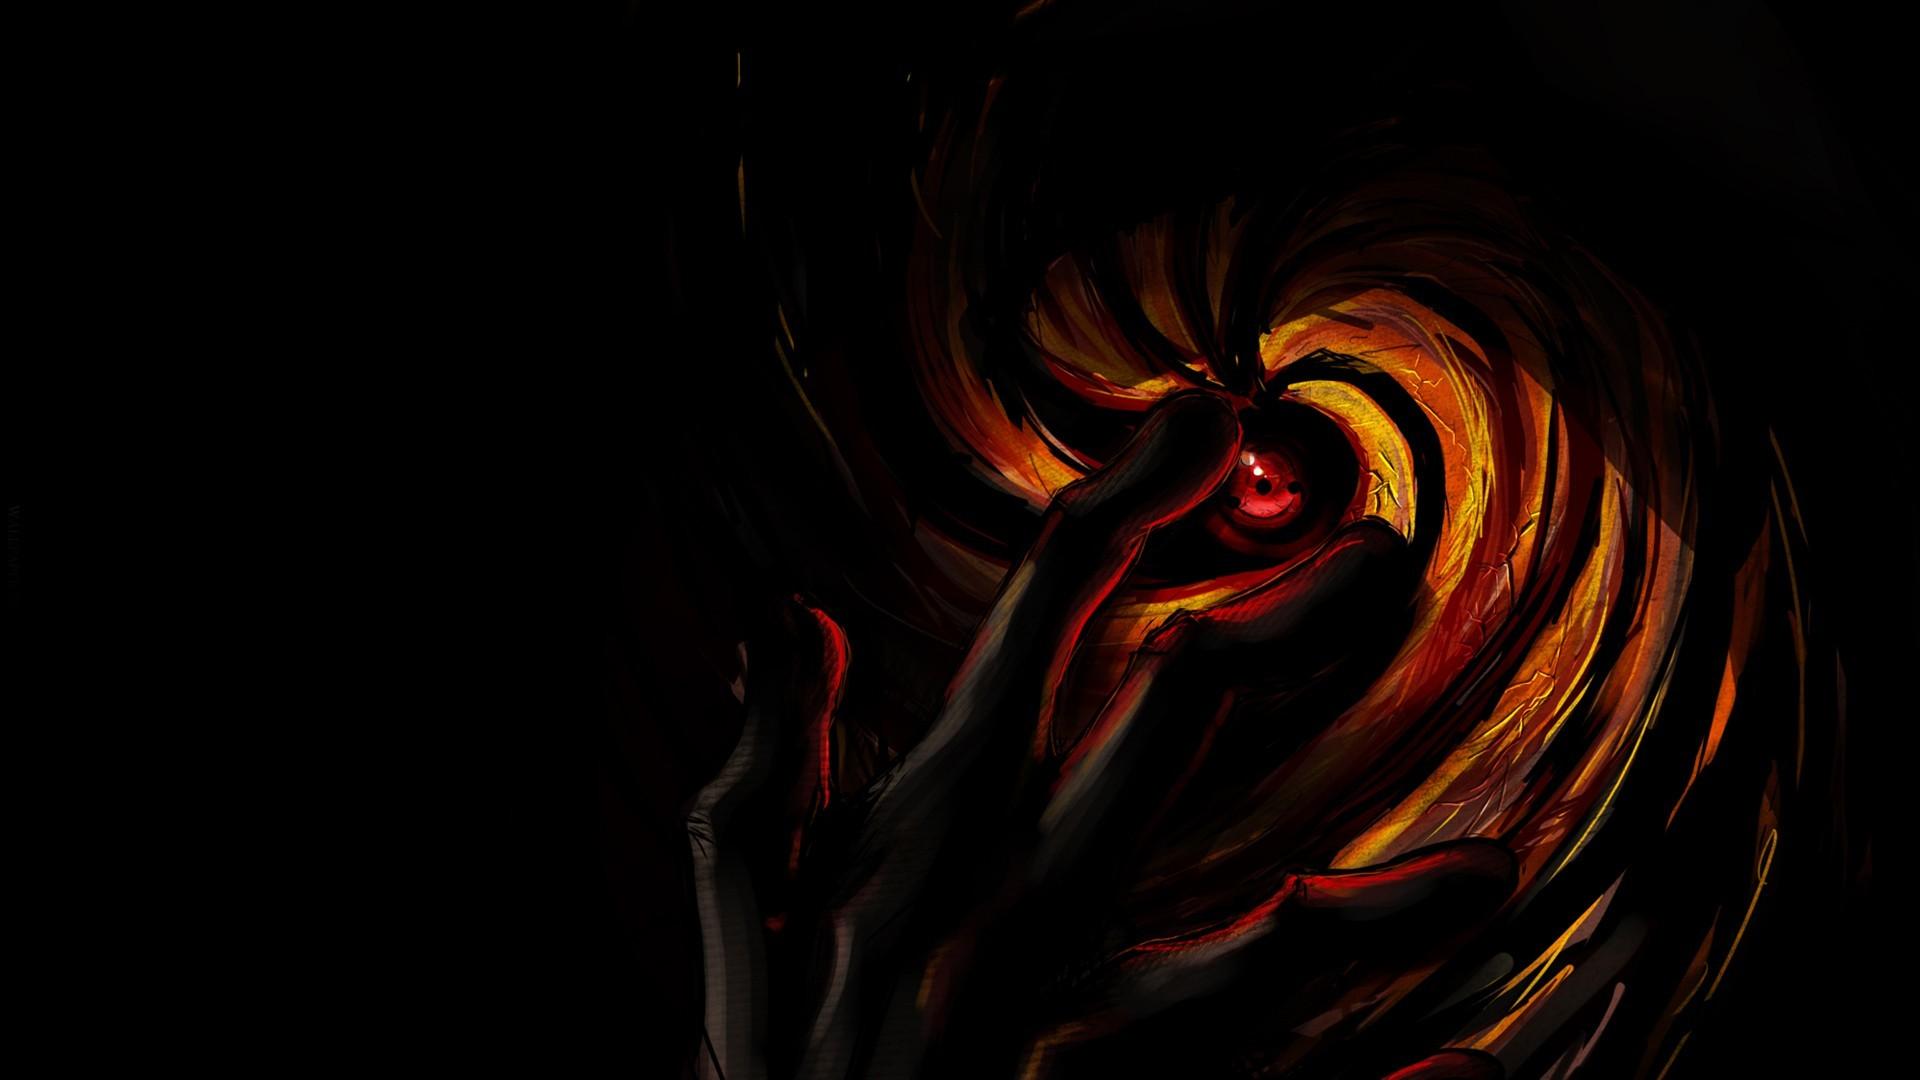 Fondo de Pantalla Naruto Zorro HD – Wallpapers HQ 1080p